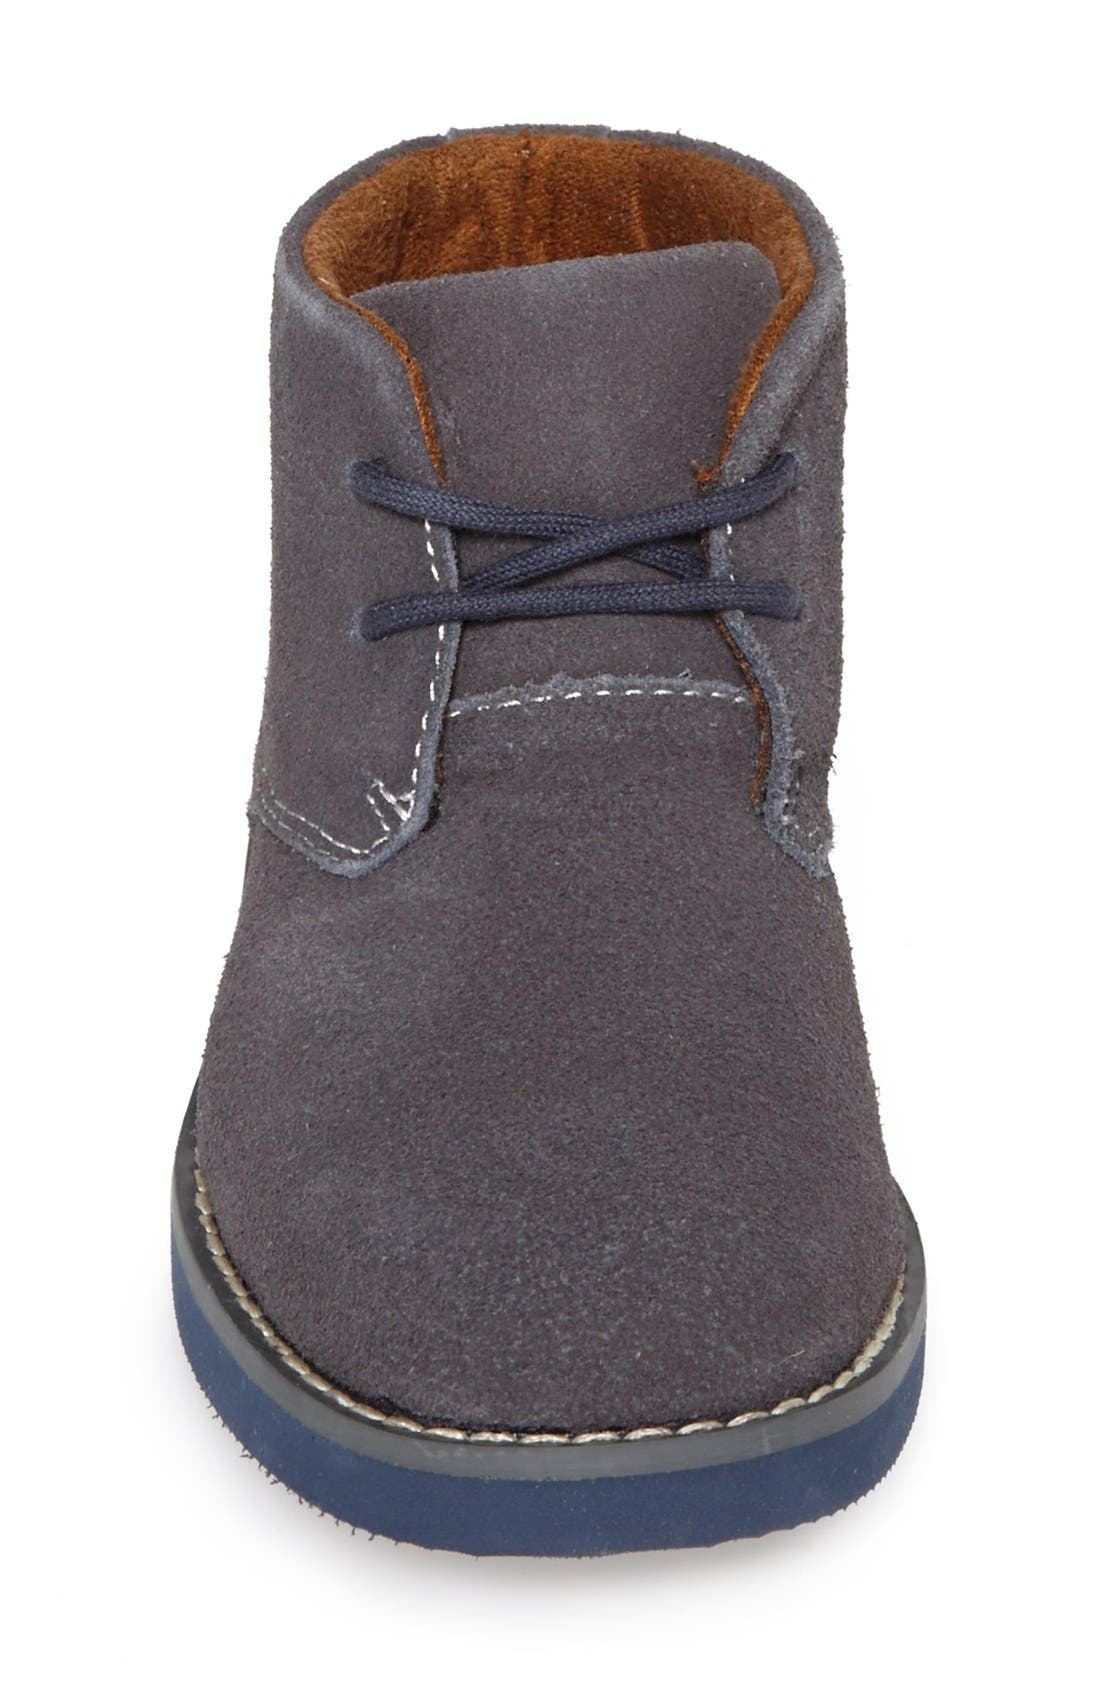 'Quinlan' Chukka Boot,                             Alternate thumbnail 3, color,                             Grey/ Navy Sole